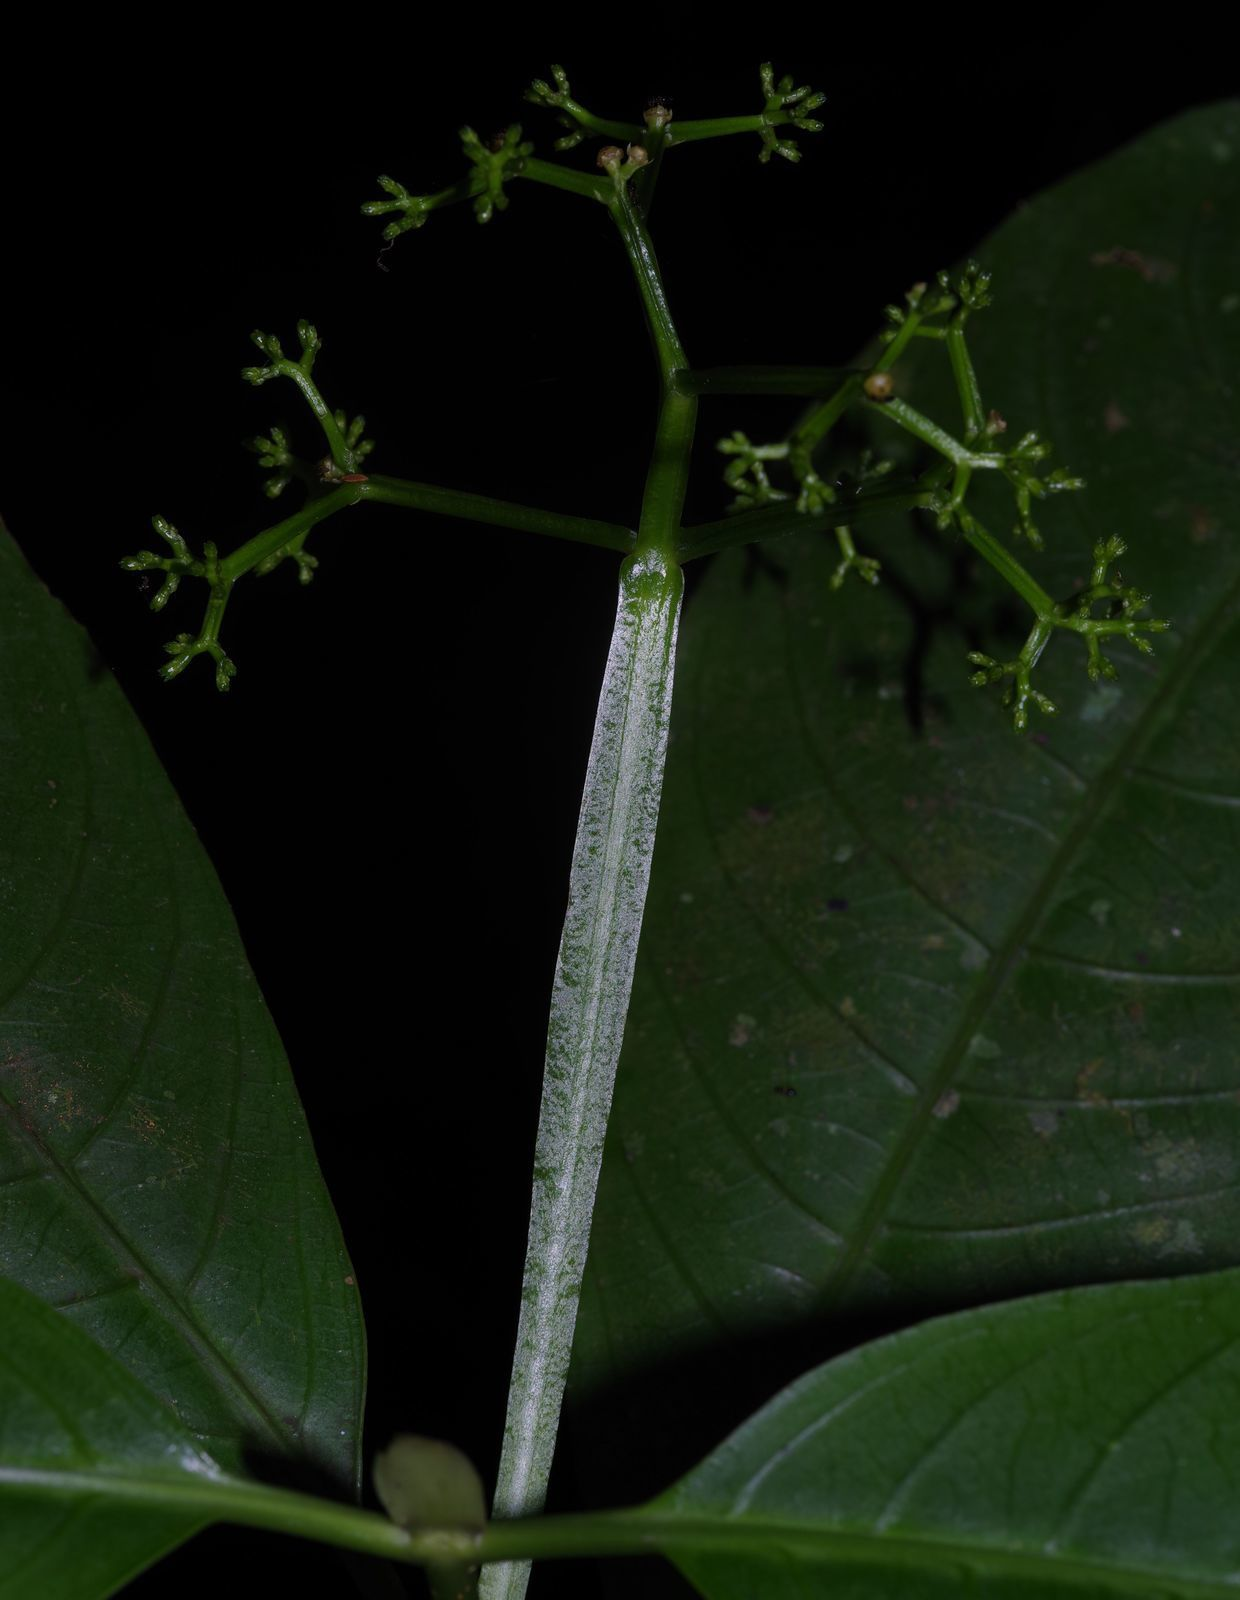 Rudgea stipulacea